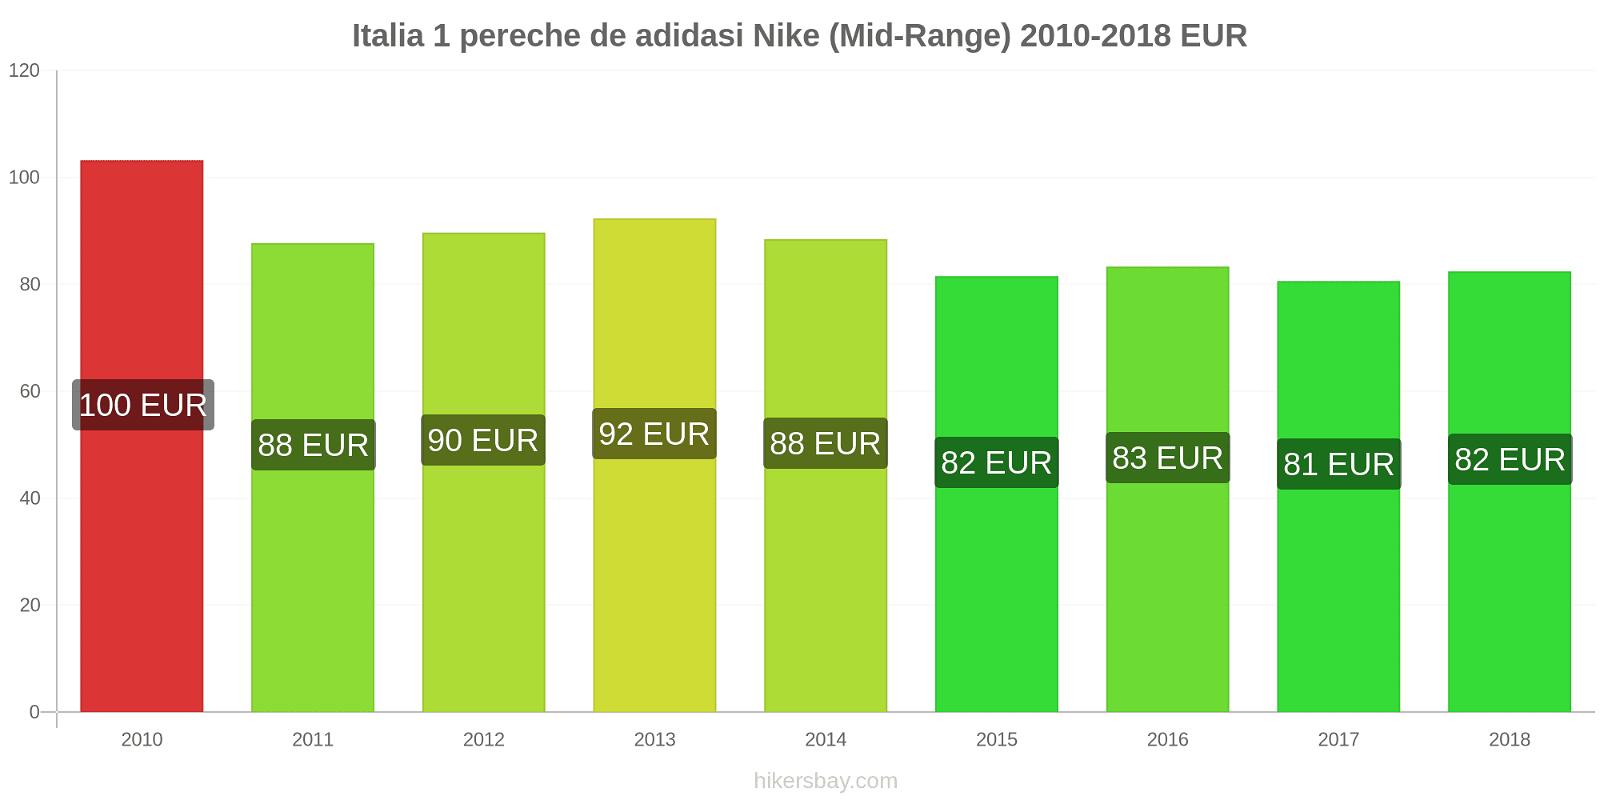 Italia modificări de preț 1 pereche de adidasi Nike (Mid-Range) hikersbay.com